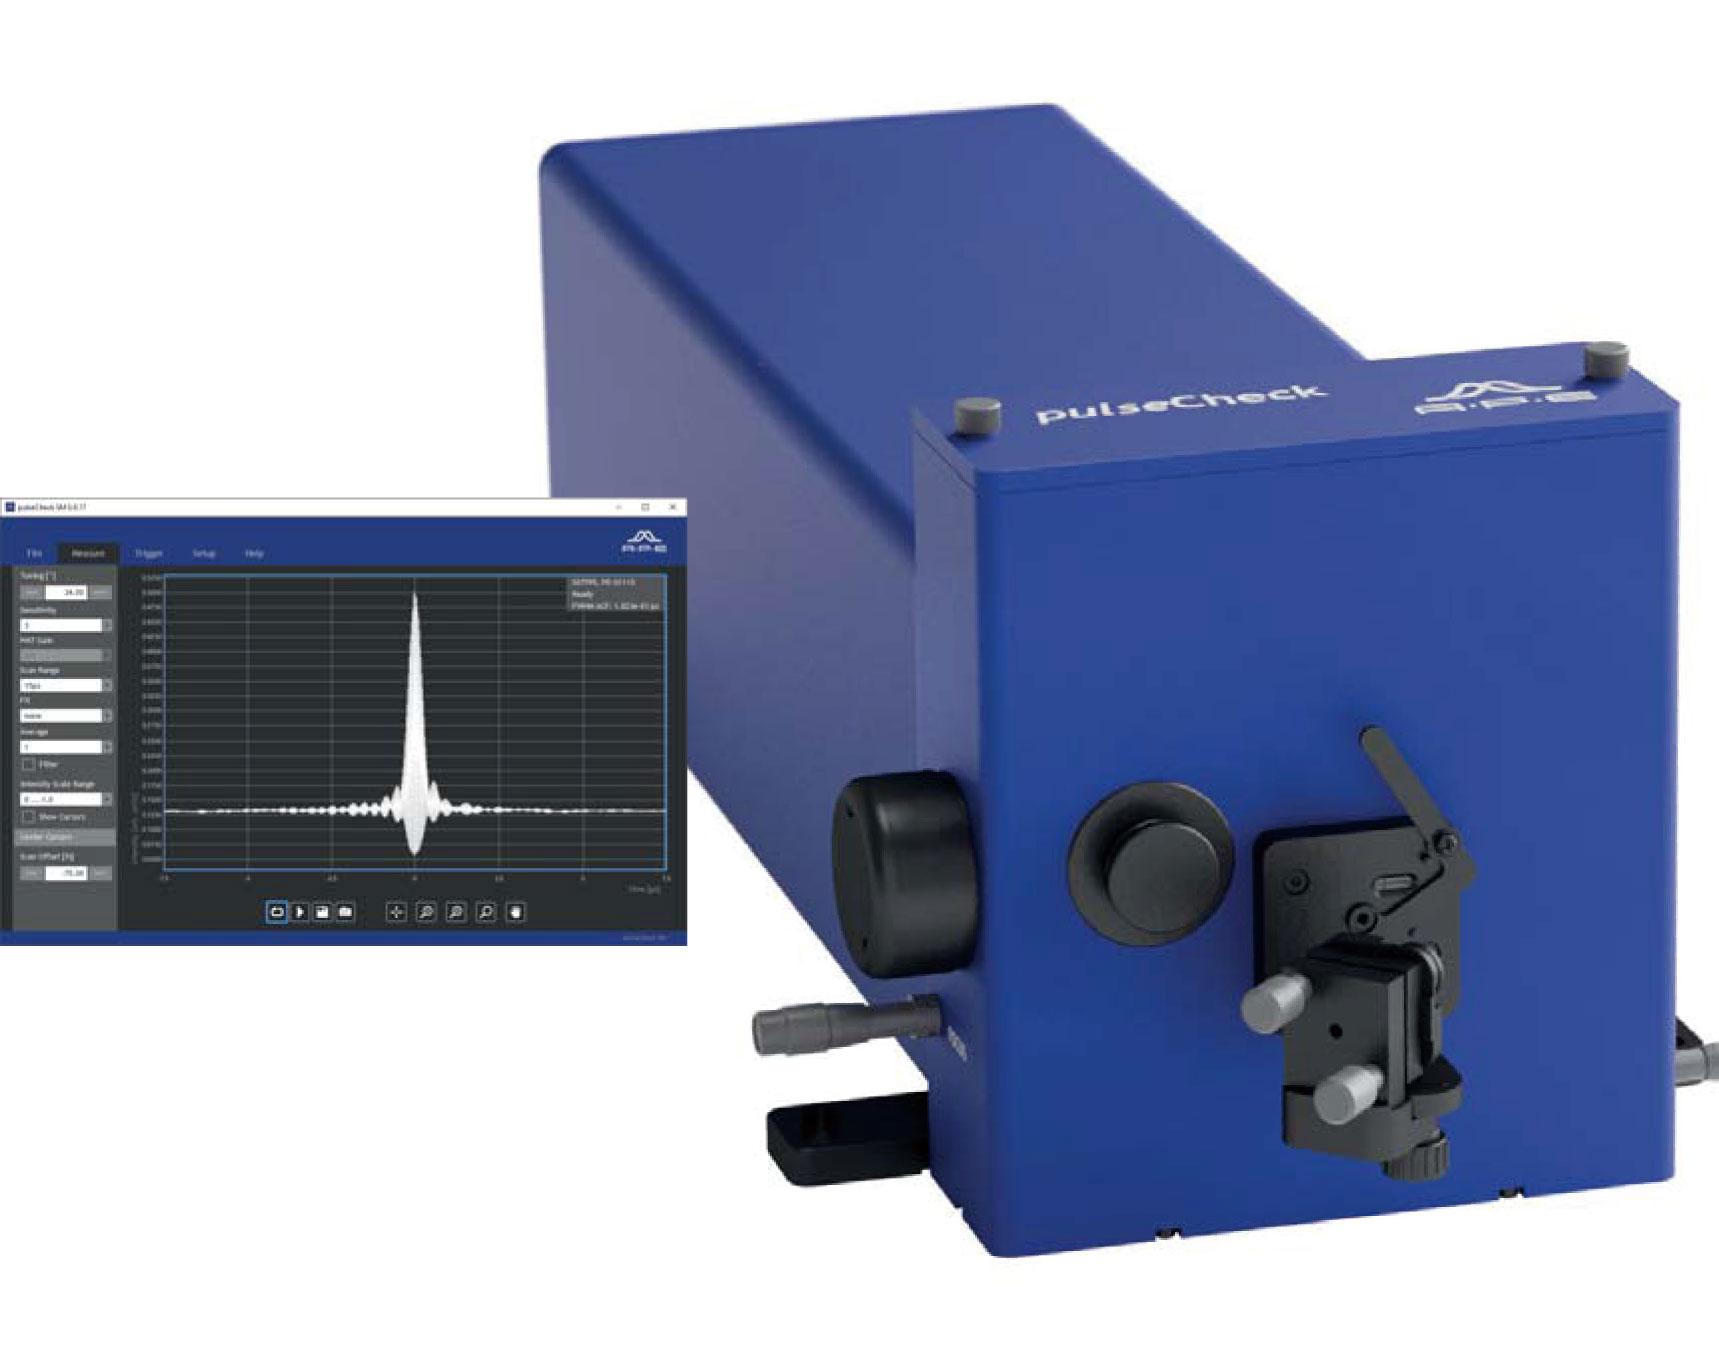 広帯域・⾼速⼀体型極短パルス幅測定器 pulseCheck SM2000